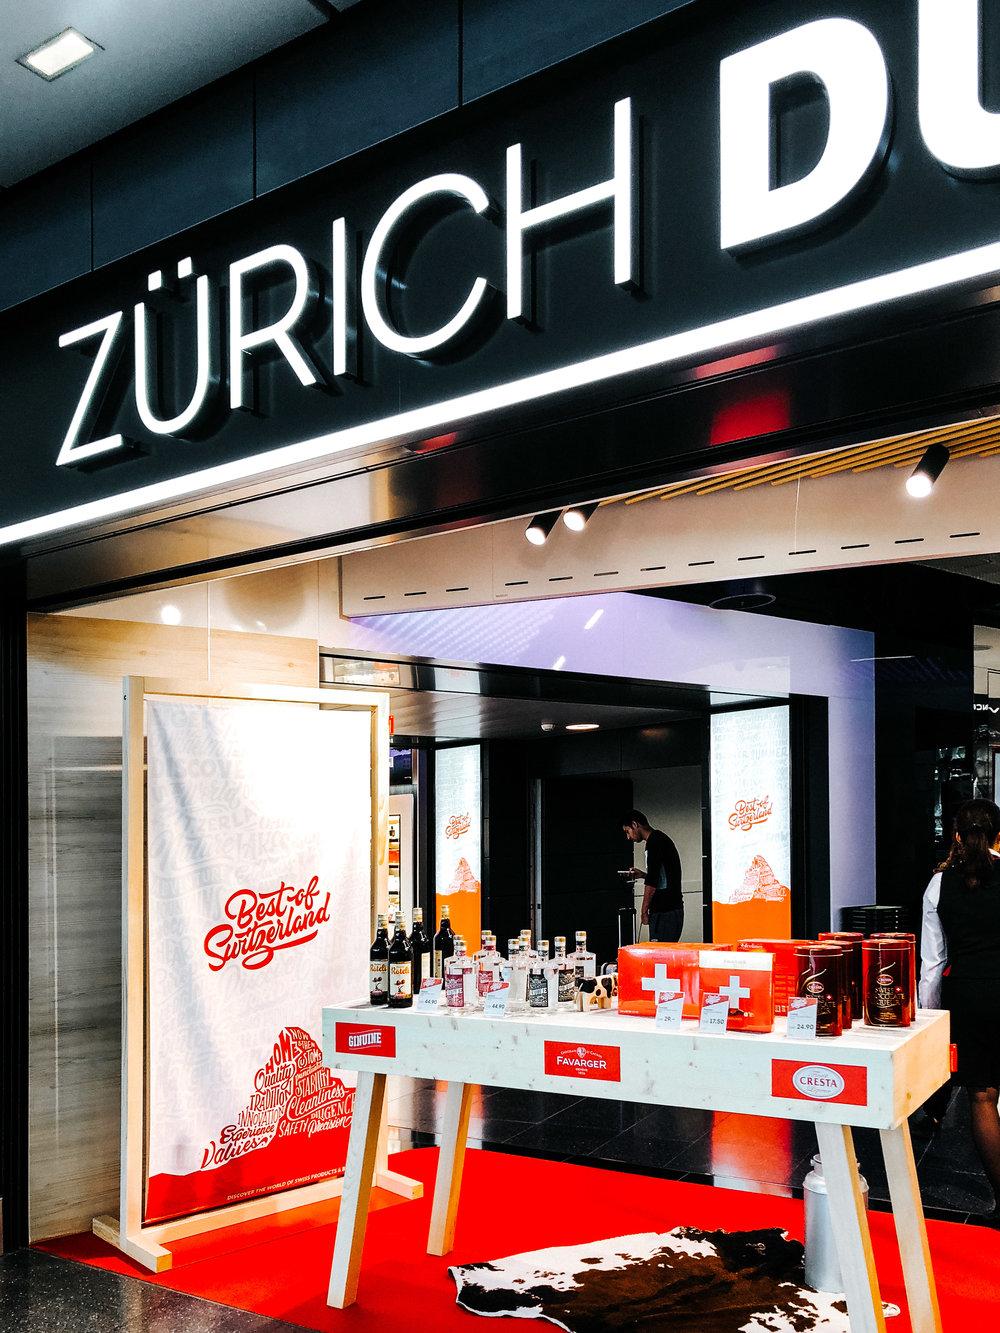 Stefan Kunz Duty Free Airport Zurich